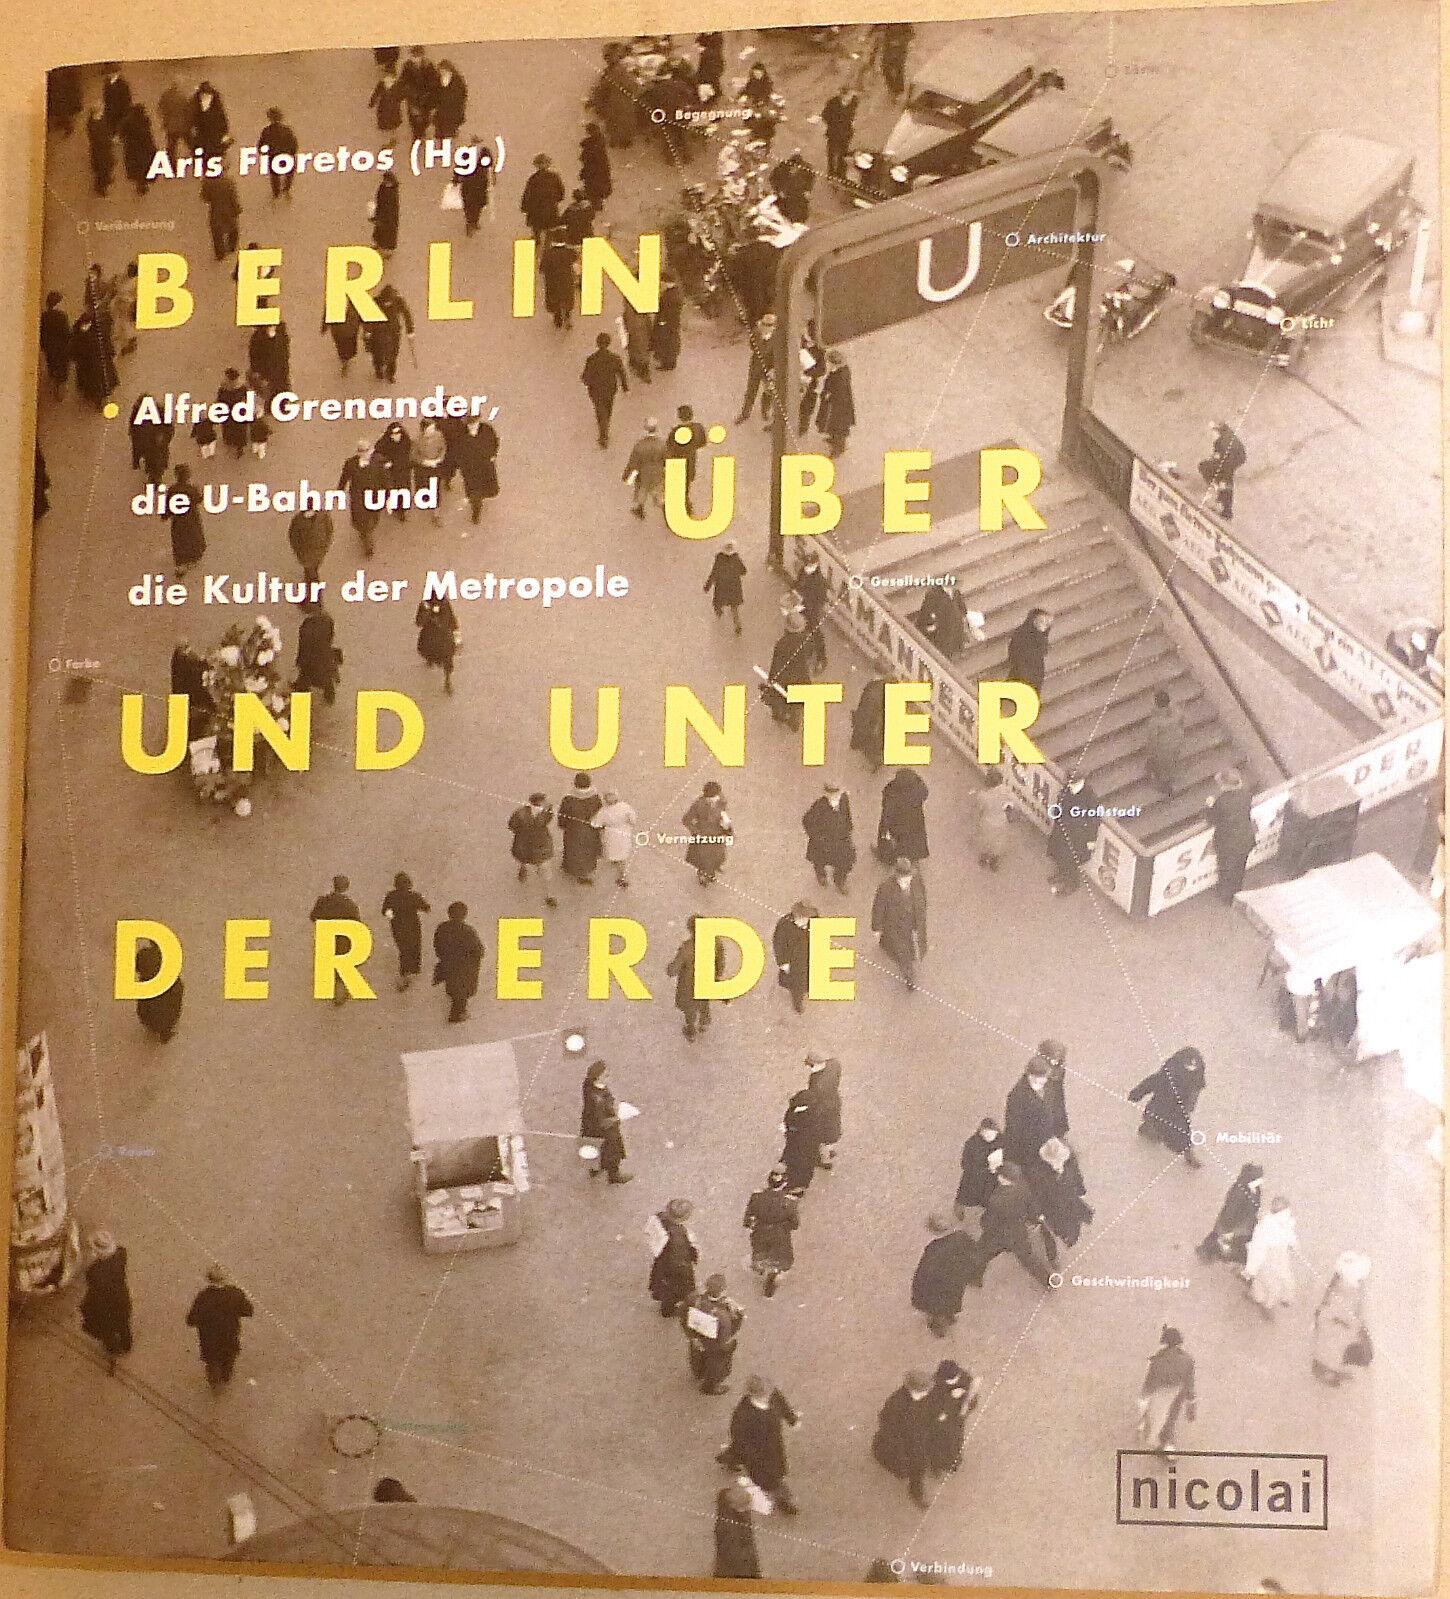 Berlino su und unter der Erde Alfrosso Grenander ARIS fioretos NICOLAI Å